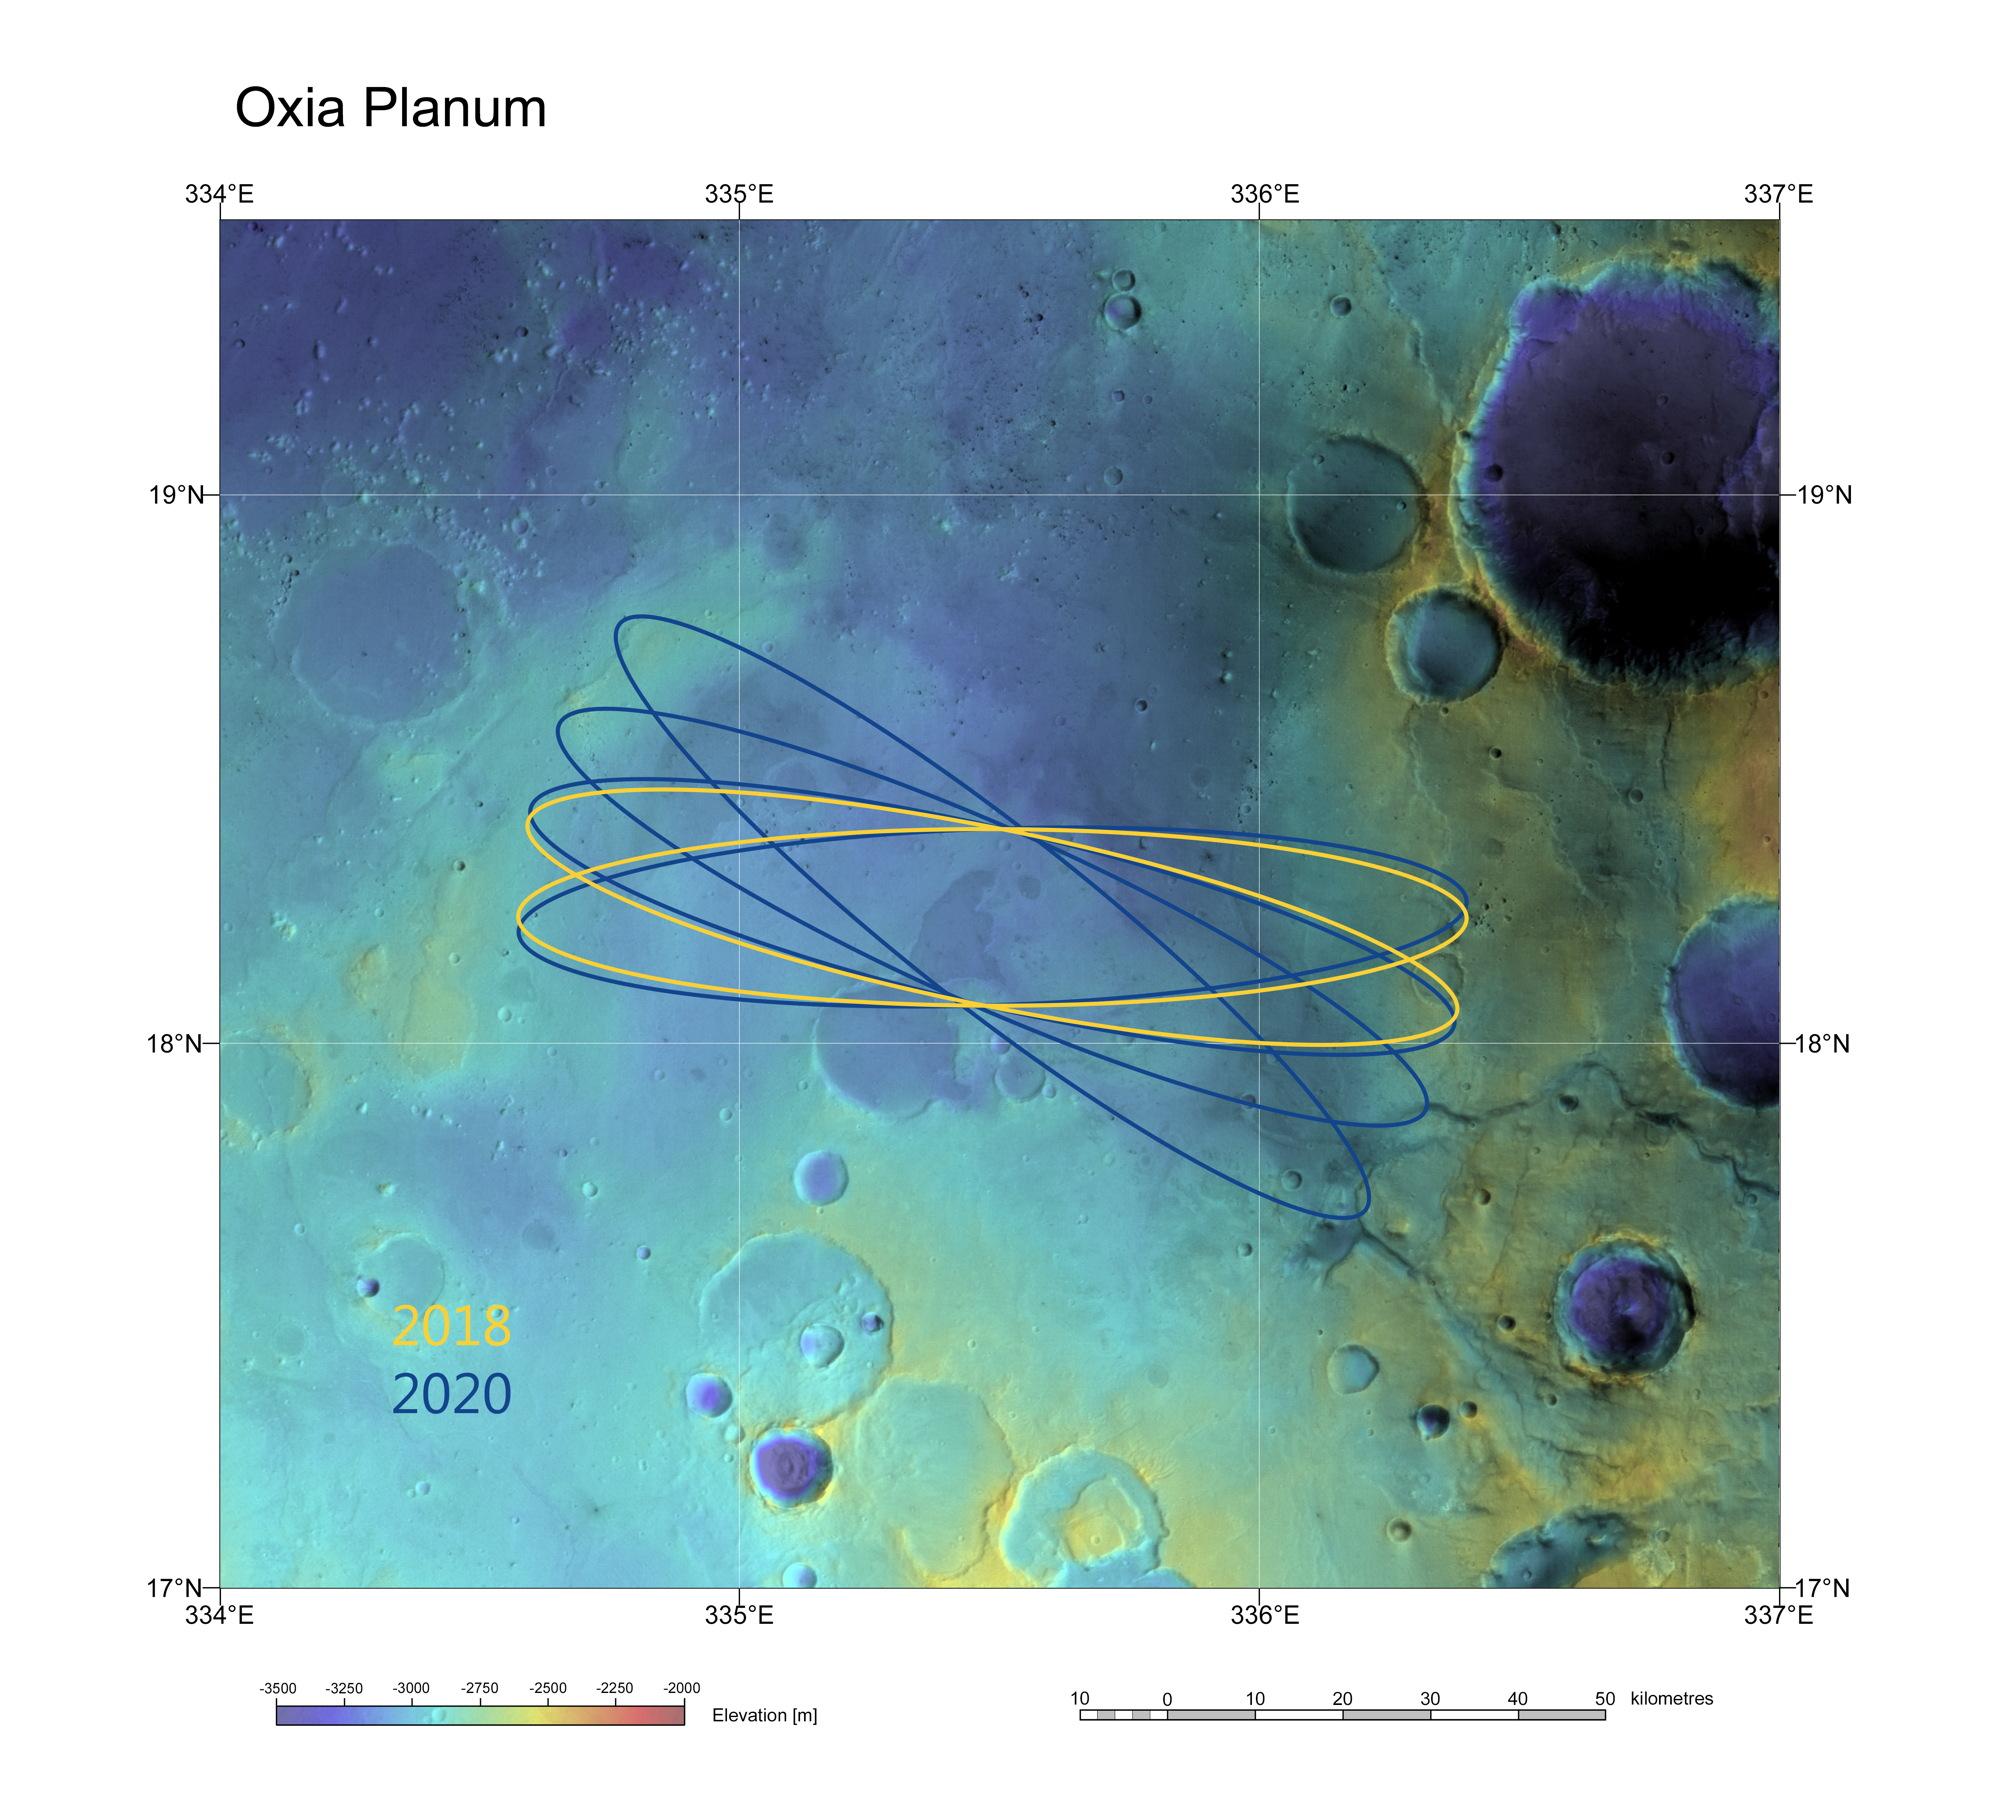 ExoMars Candidate Landing Site Oxia Planum